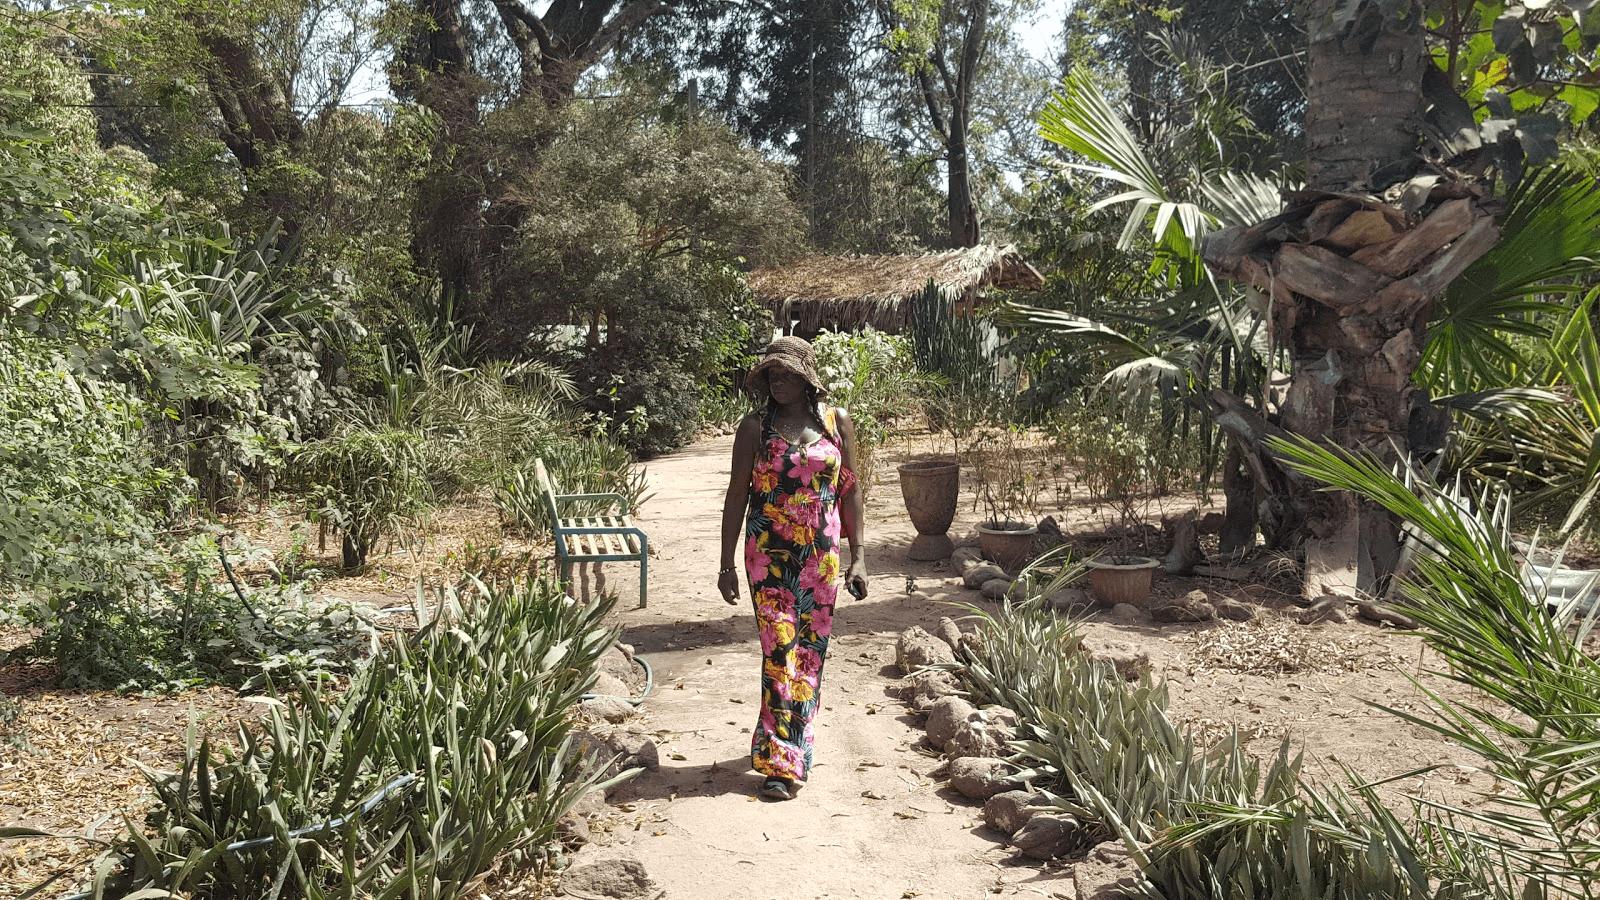 Bakau's Botanical Garden